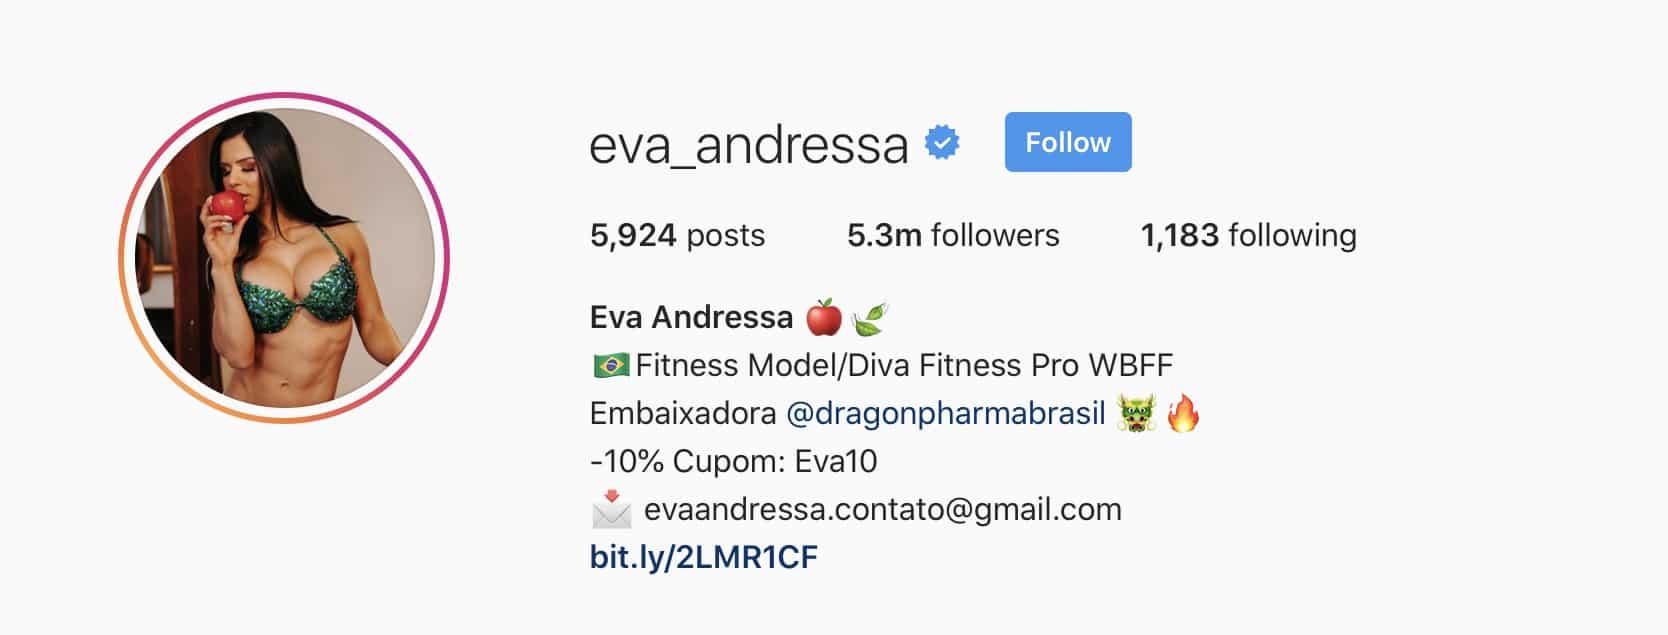 Eva_andressa Instagram